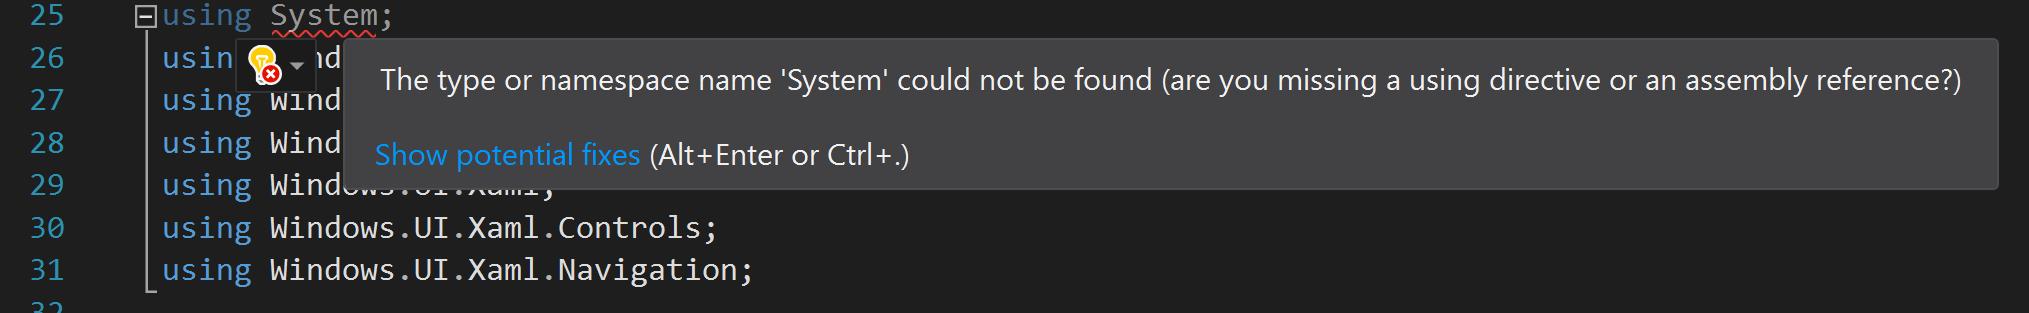 Using System Error